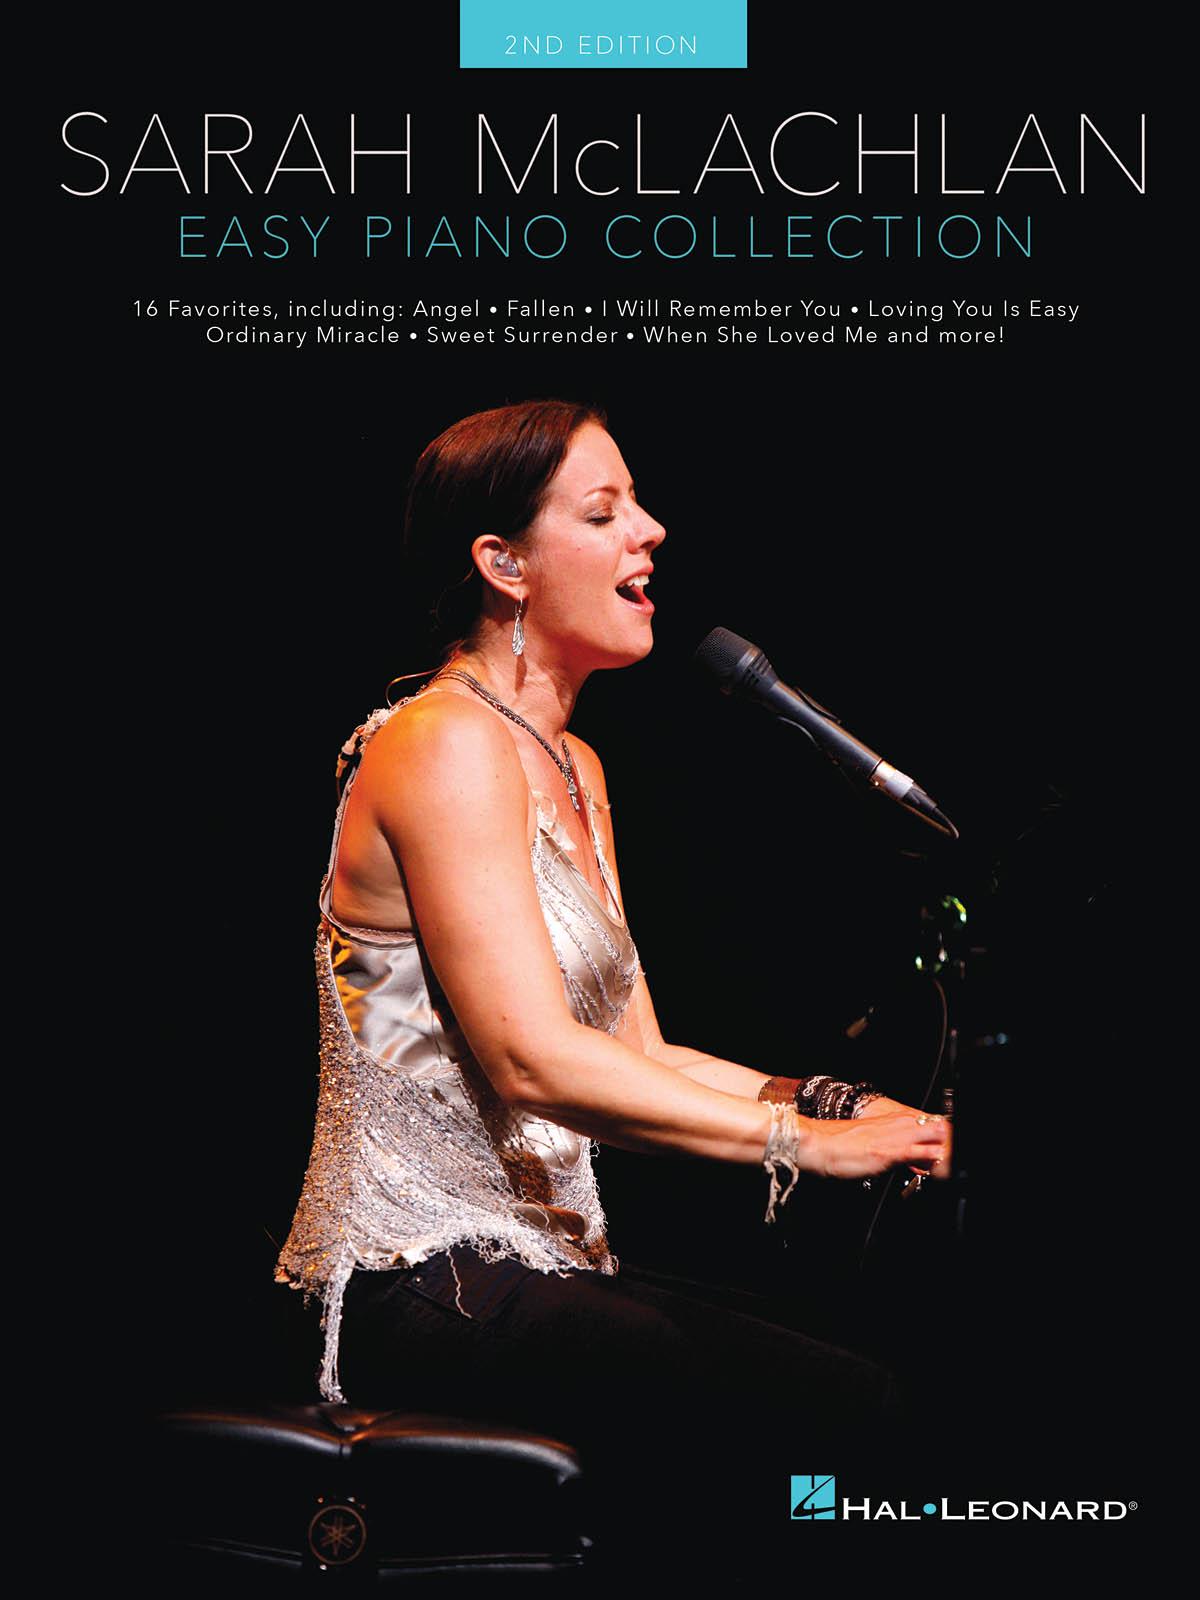 Sarah McLachlan: Sarah McLachlan Collection - Second Edition: Easy Piano: Artist